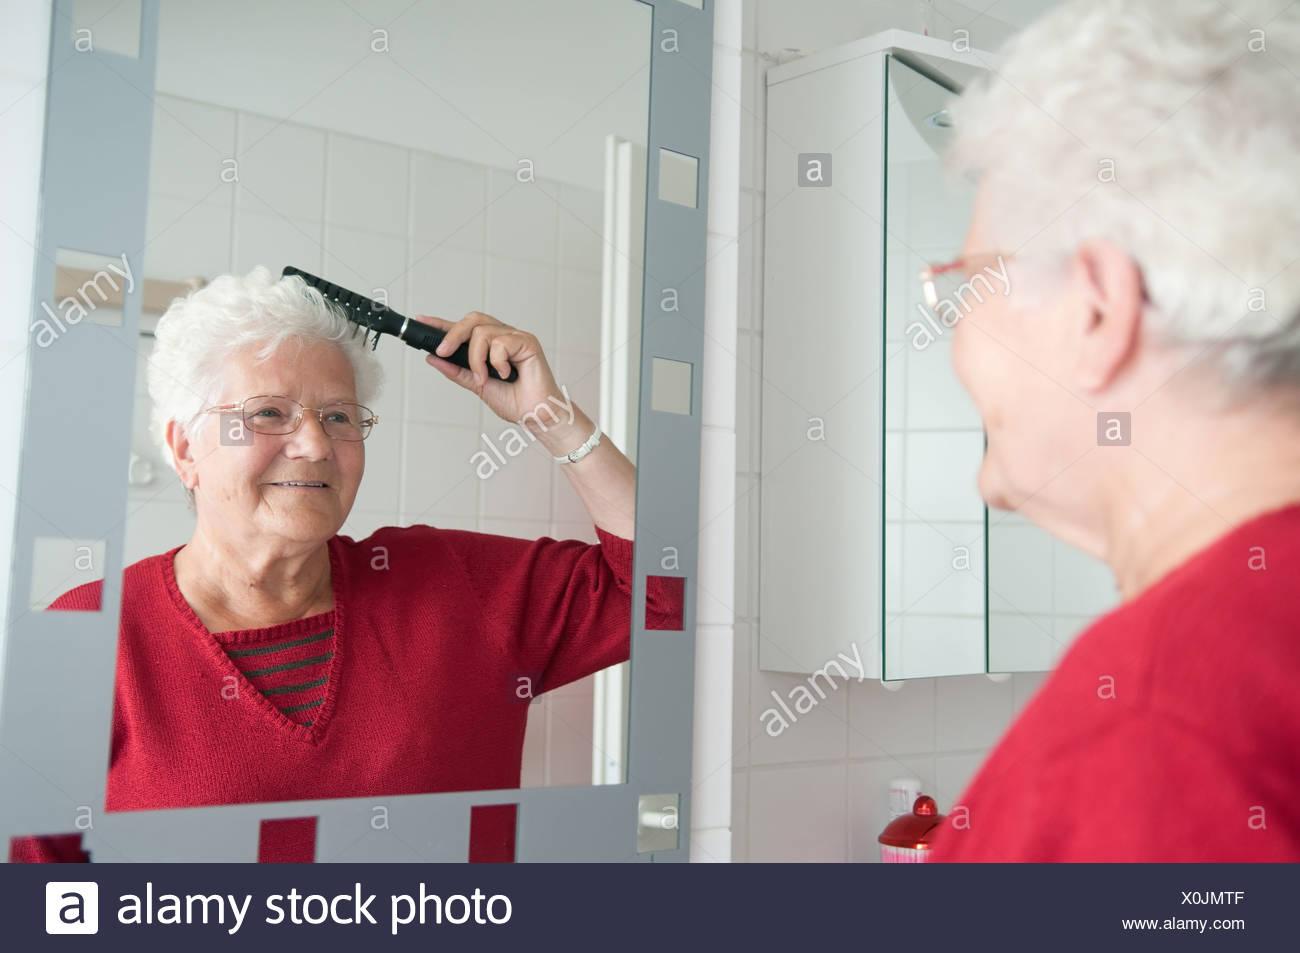 24 sata Vučić - Page 5 Grandma-is-combing-the-hair-X0JMTF